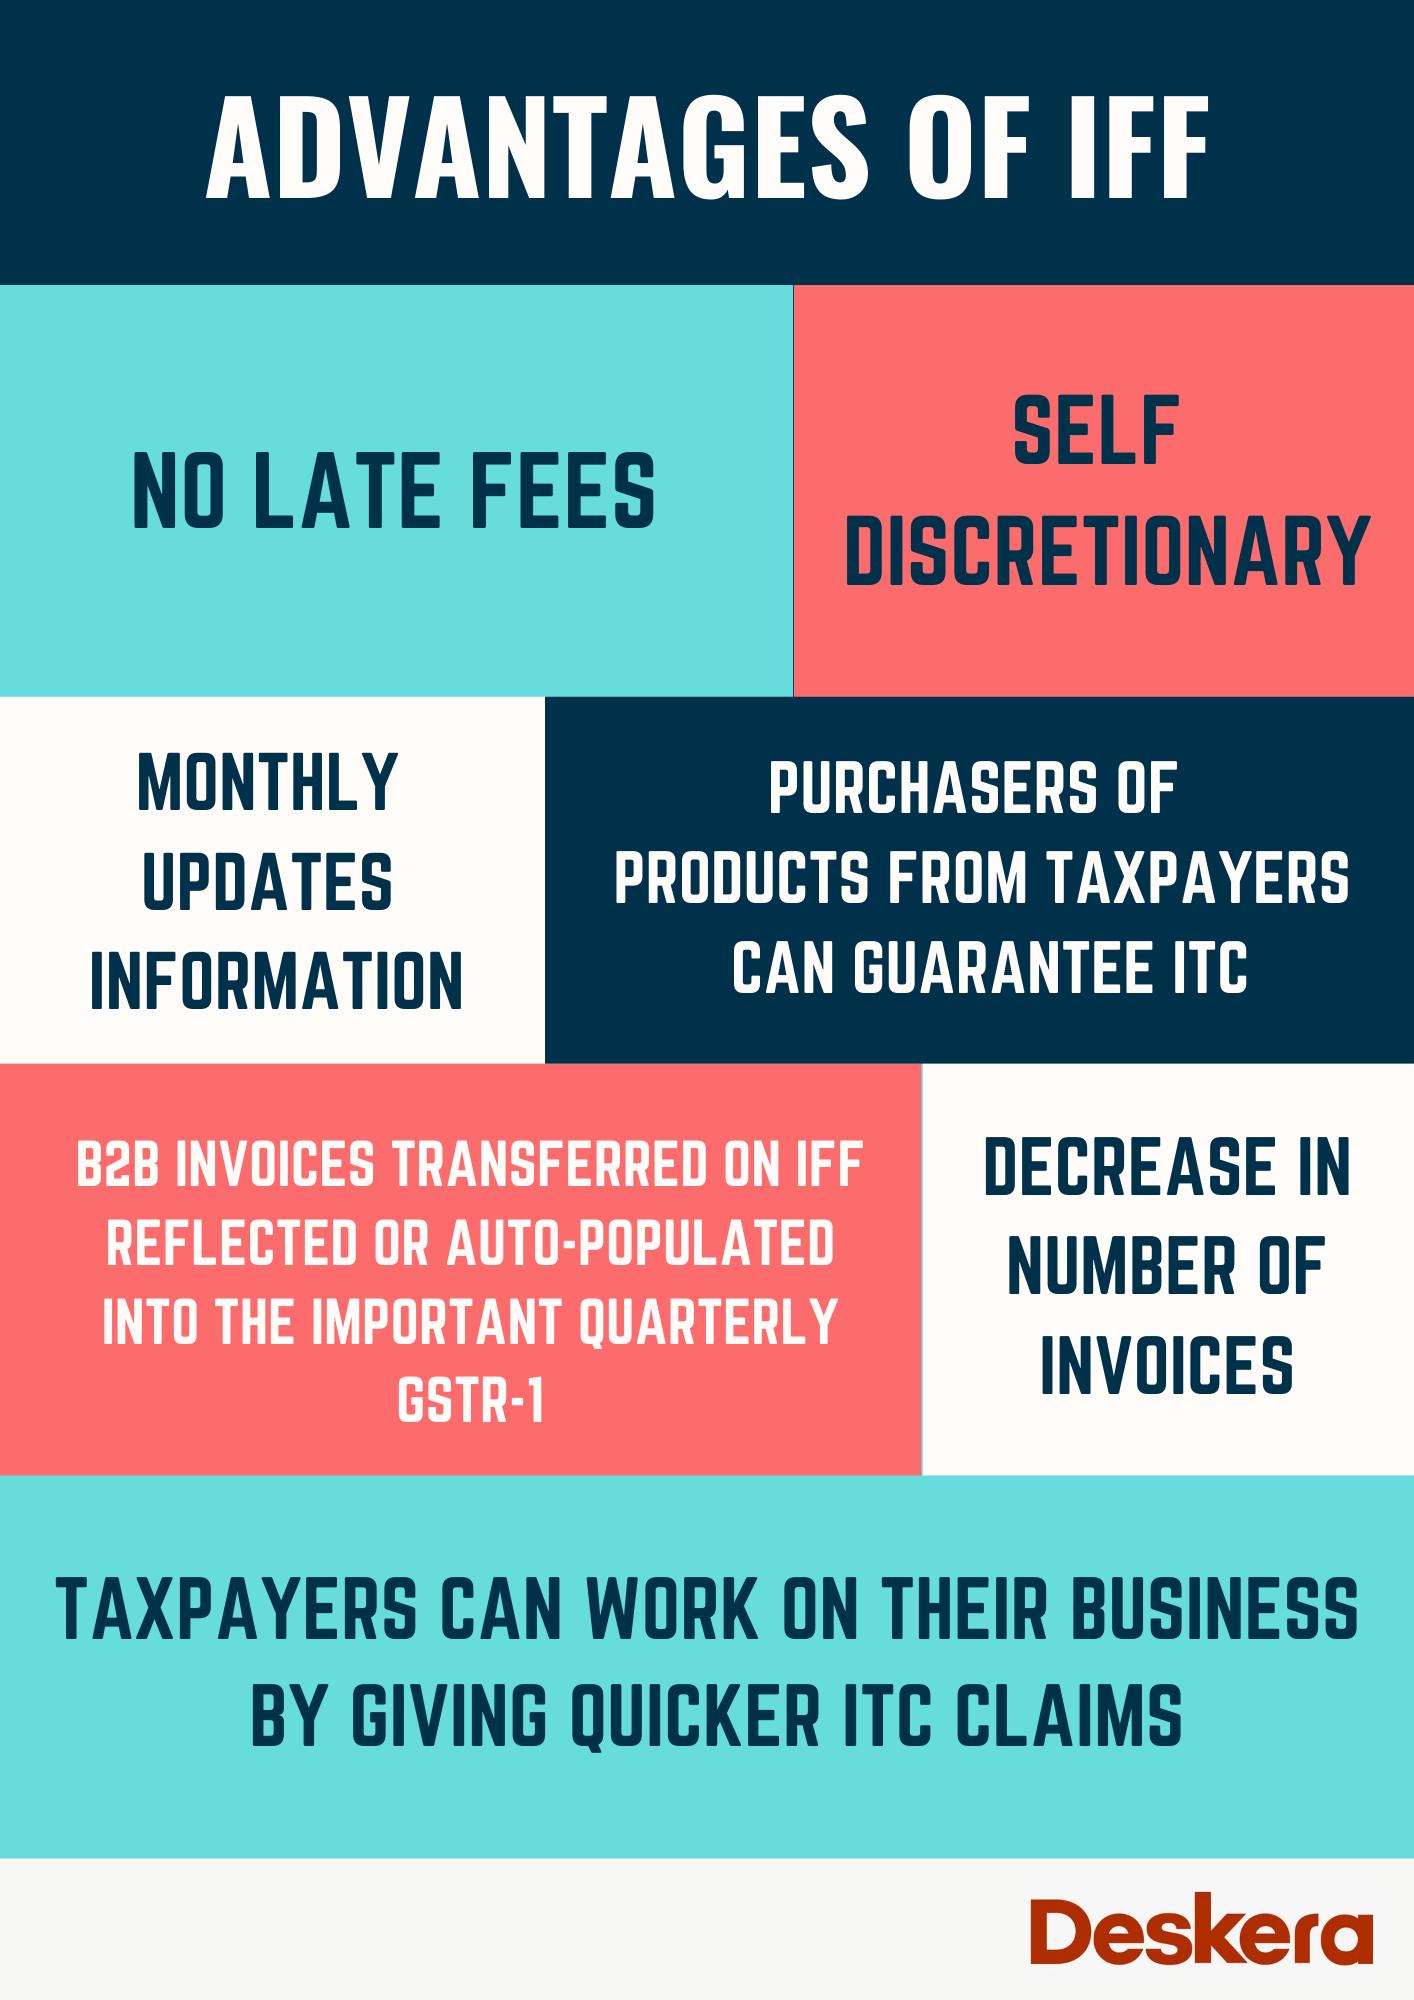 Advantages of IFF